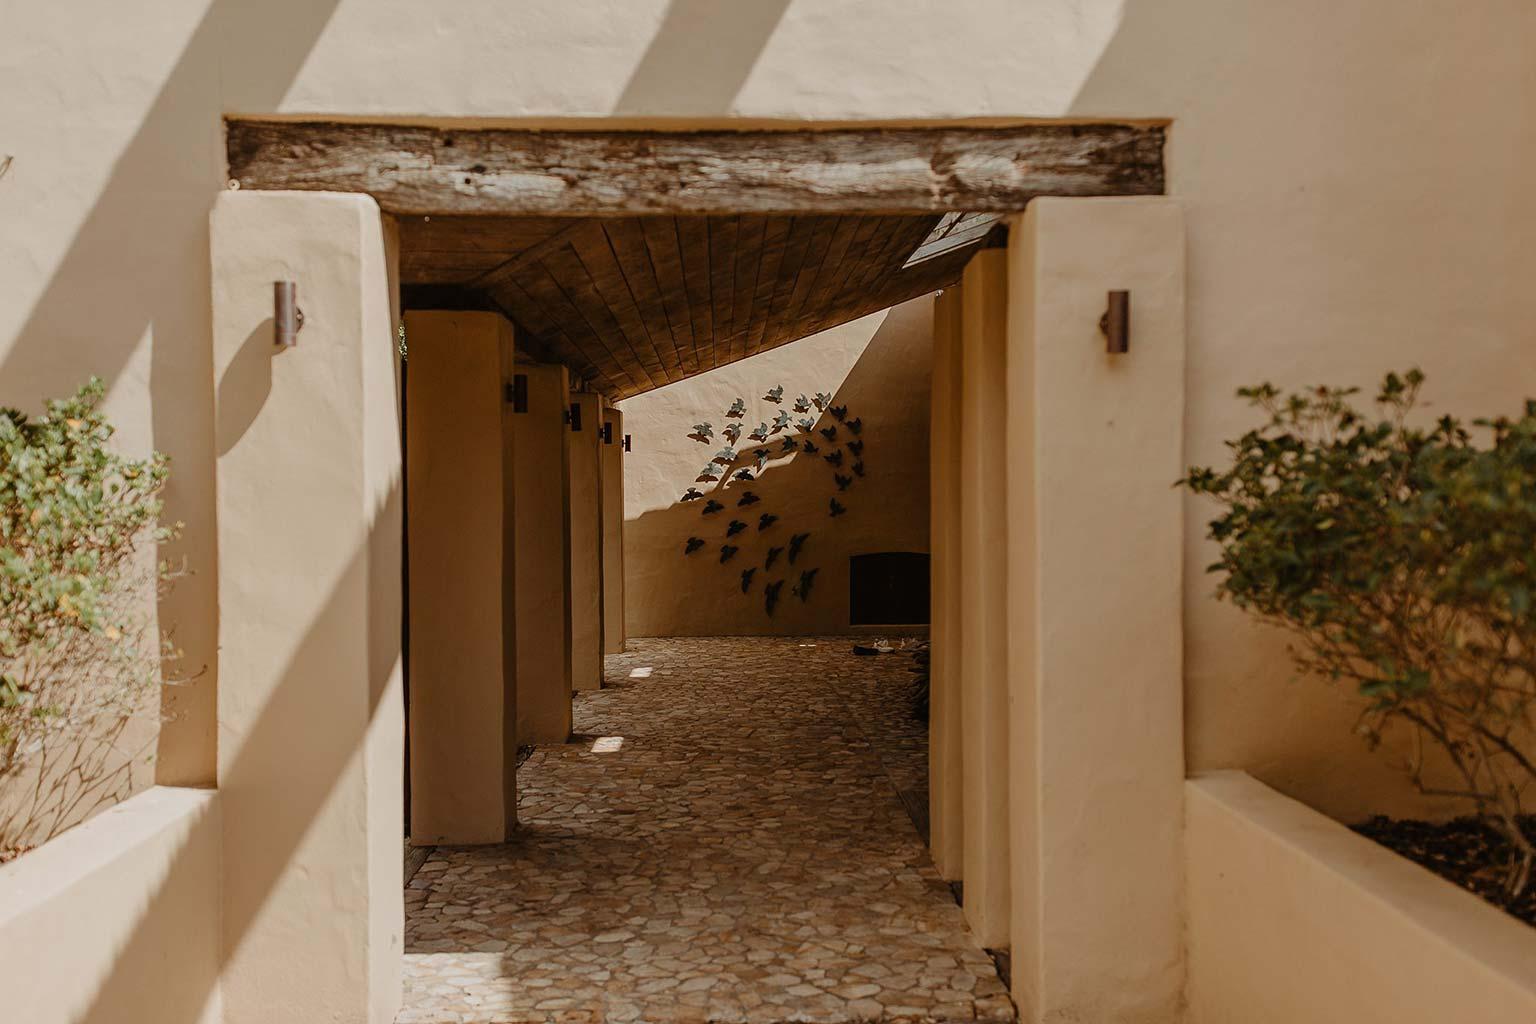 Vinka Design Features Real Weddings - Mudbrick Vineyard archways